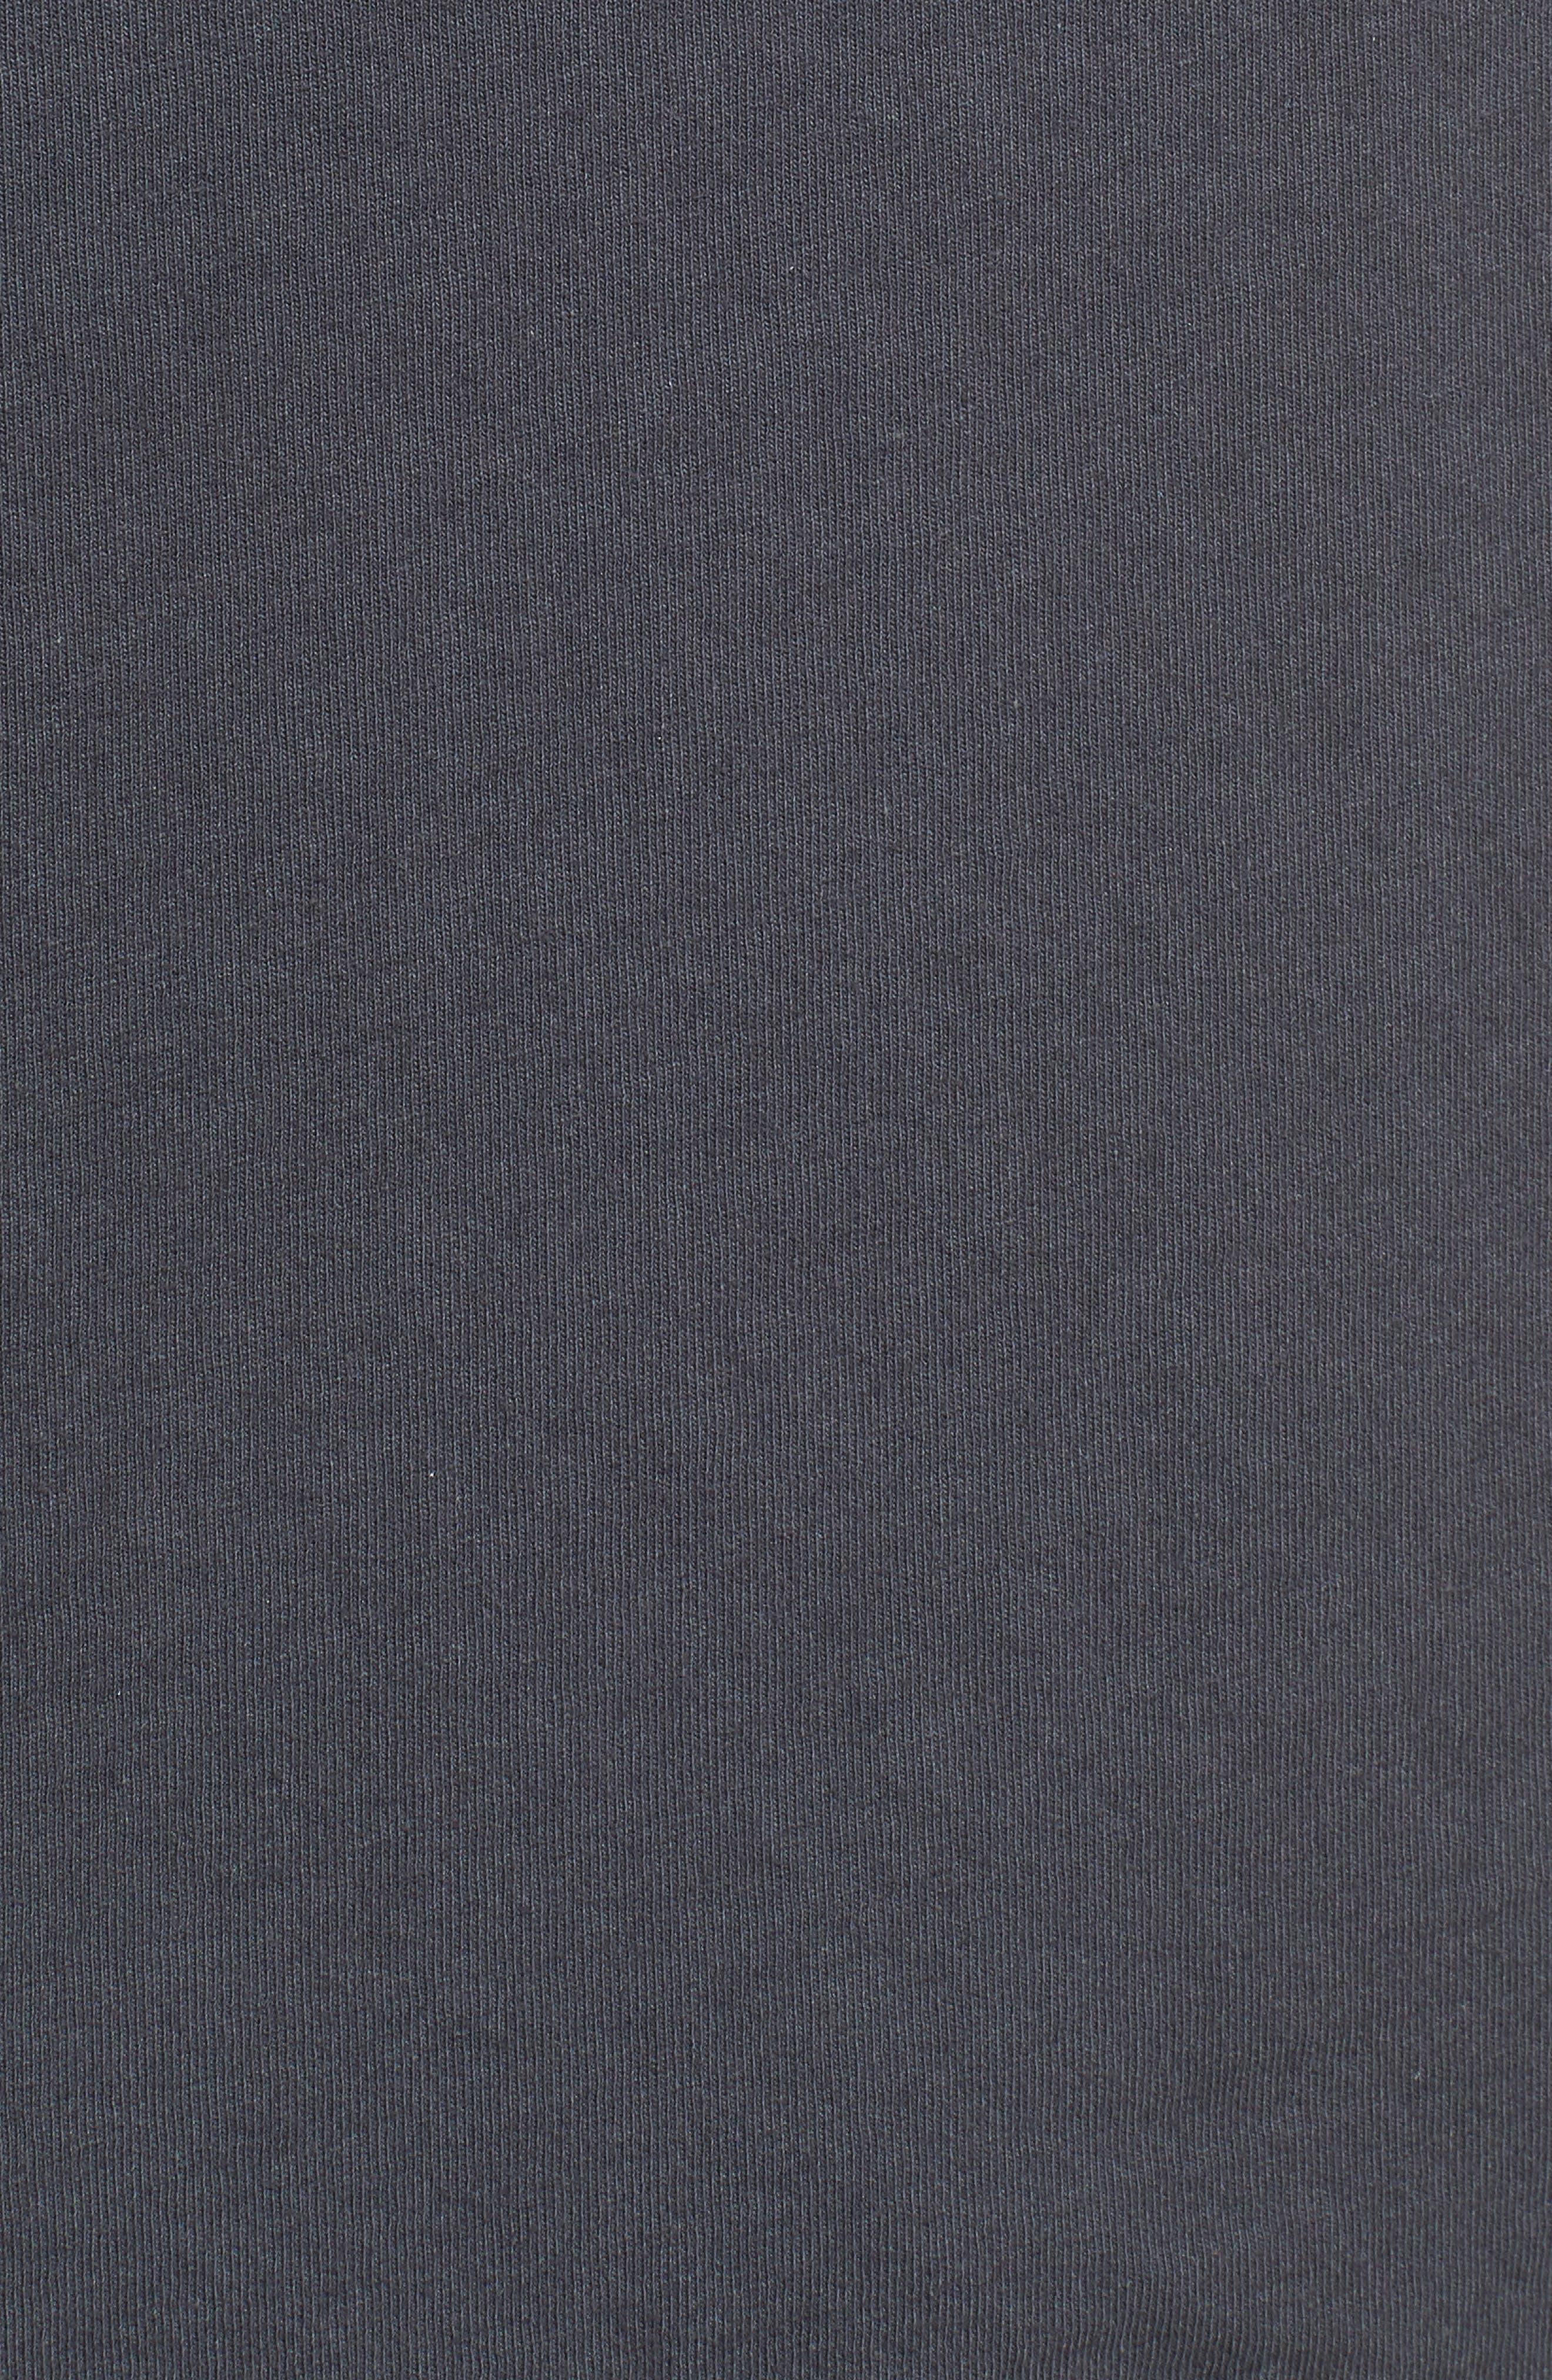 Joe Cool Checkerboard Tee,                             Alternate thumbnail 6, color,                             Black